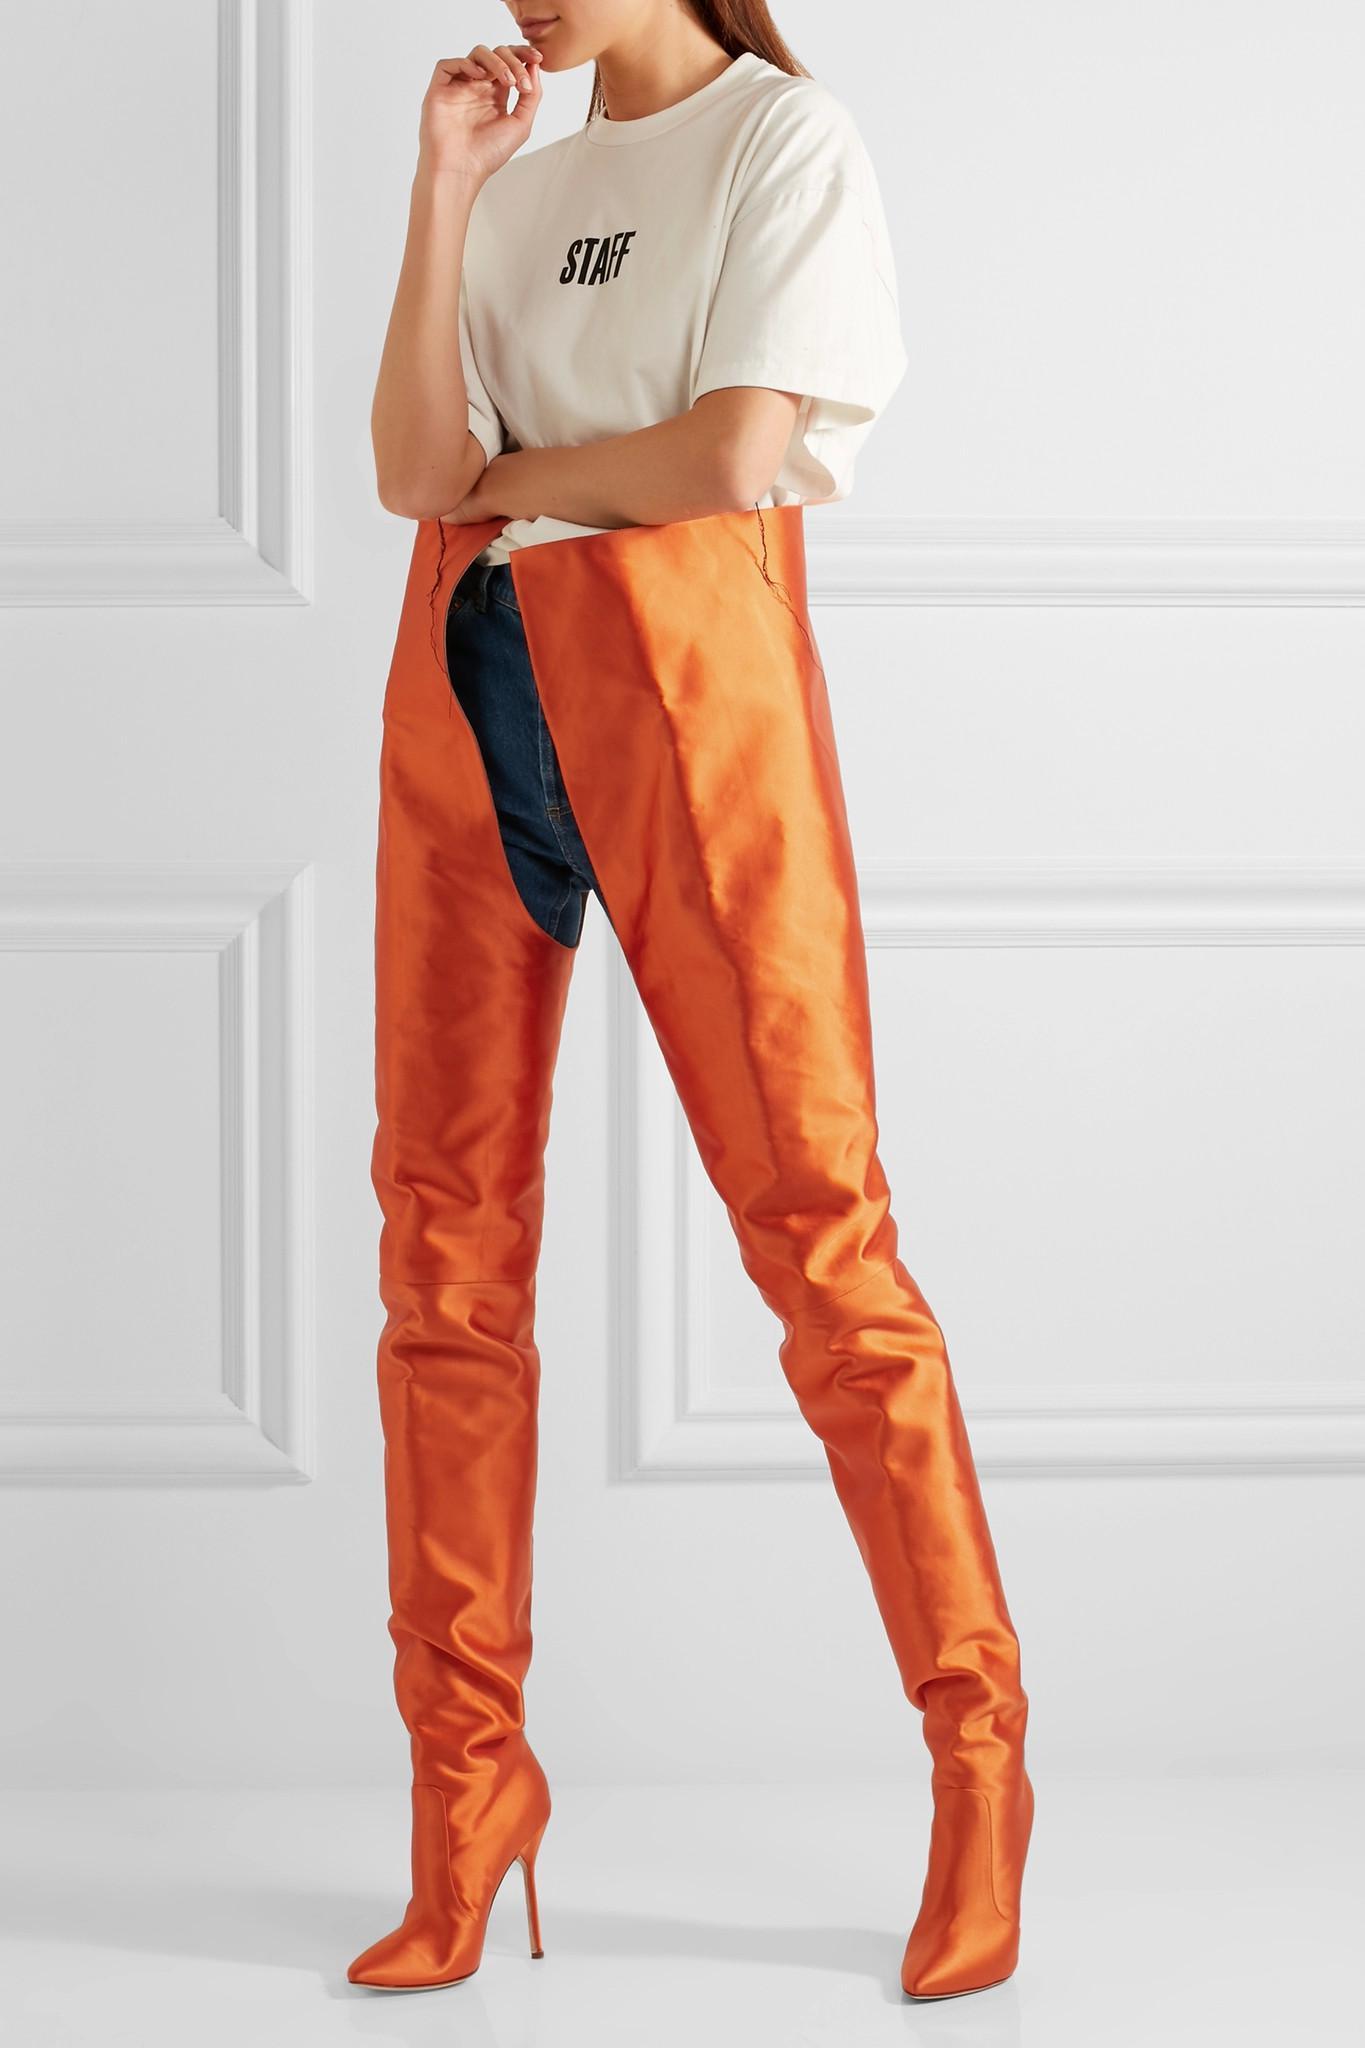 Lyst Vetements Manolo Blahnik Satin Boots In Orange